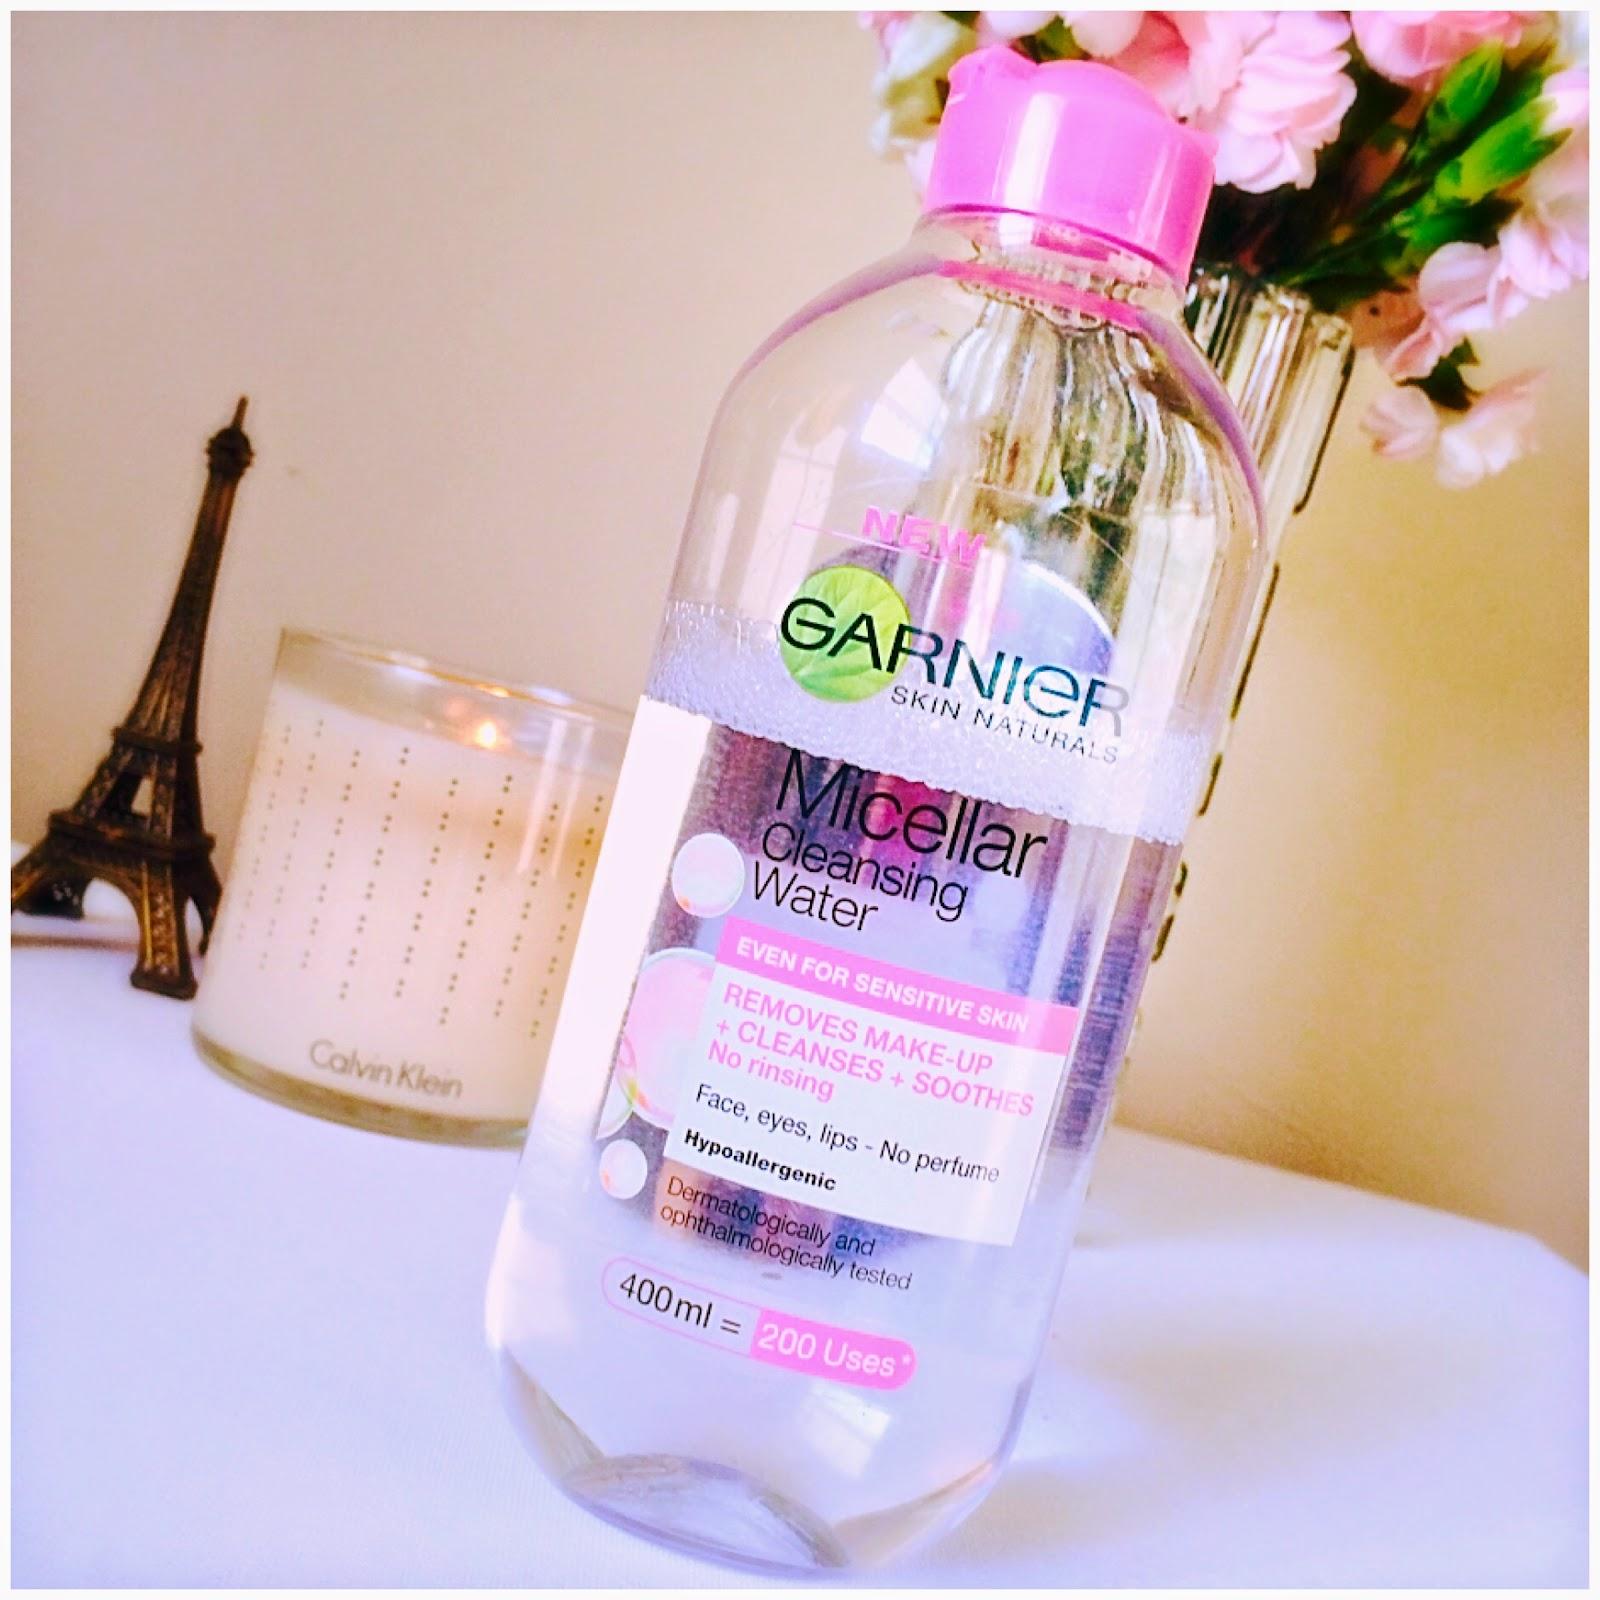 Garnier Micellar Cleansing Water - livingandbeauty.com